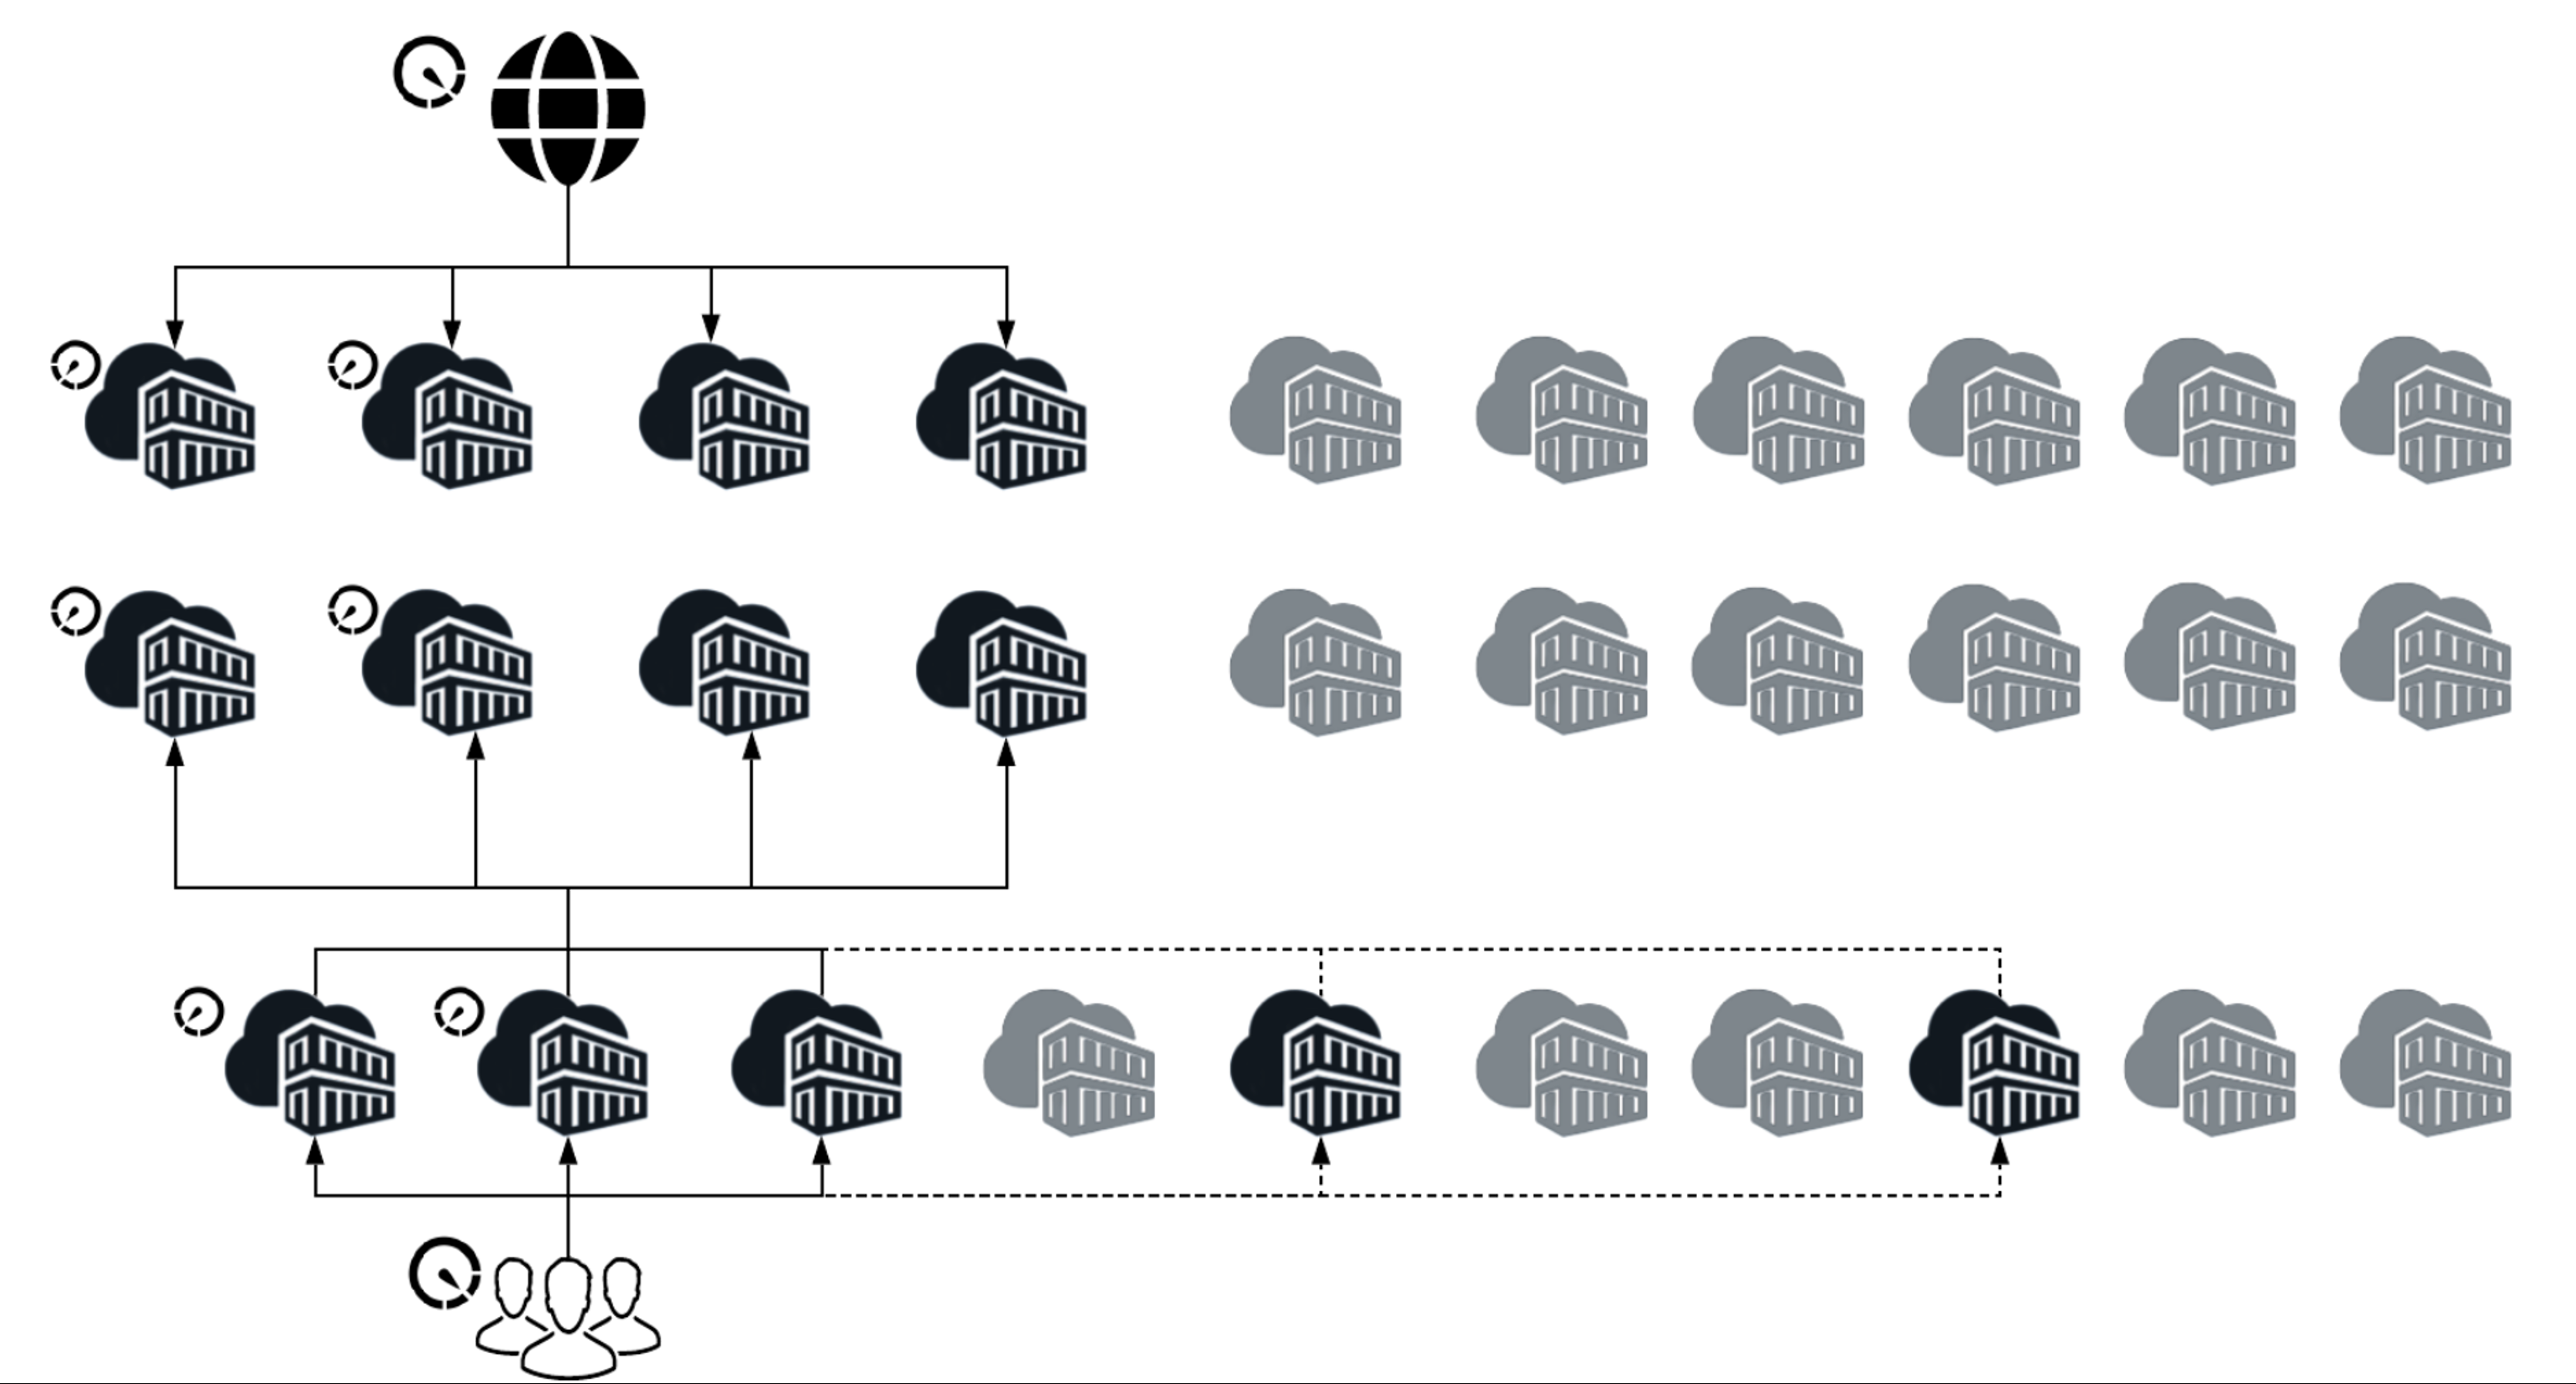 AEM Cloud Service Architecture